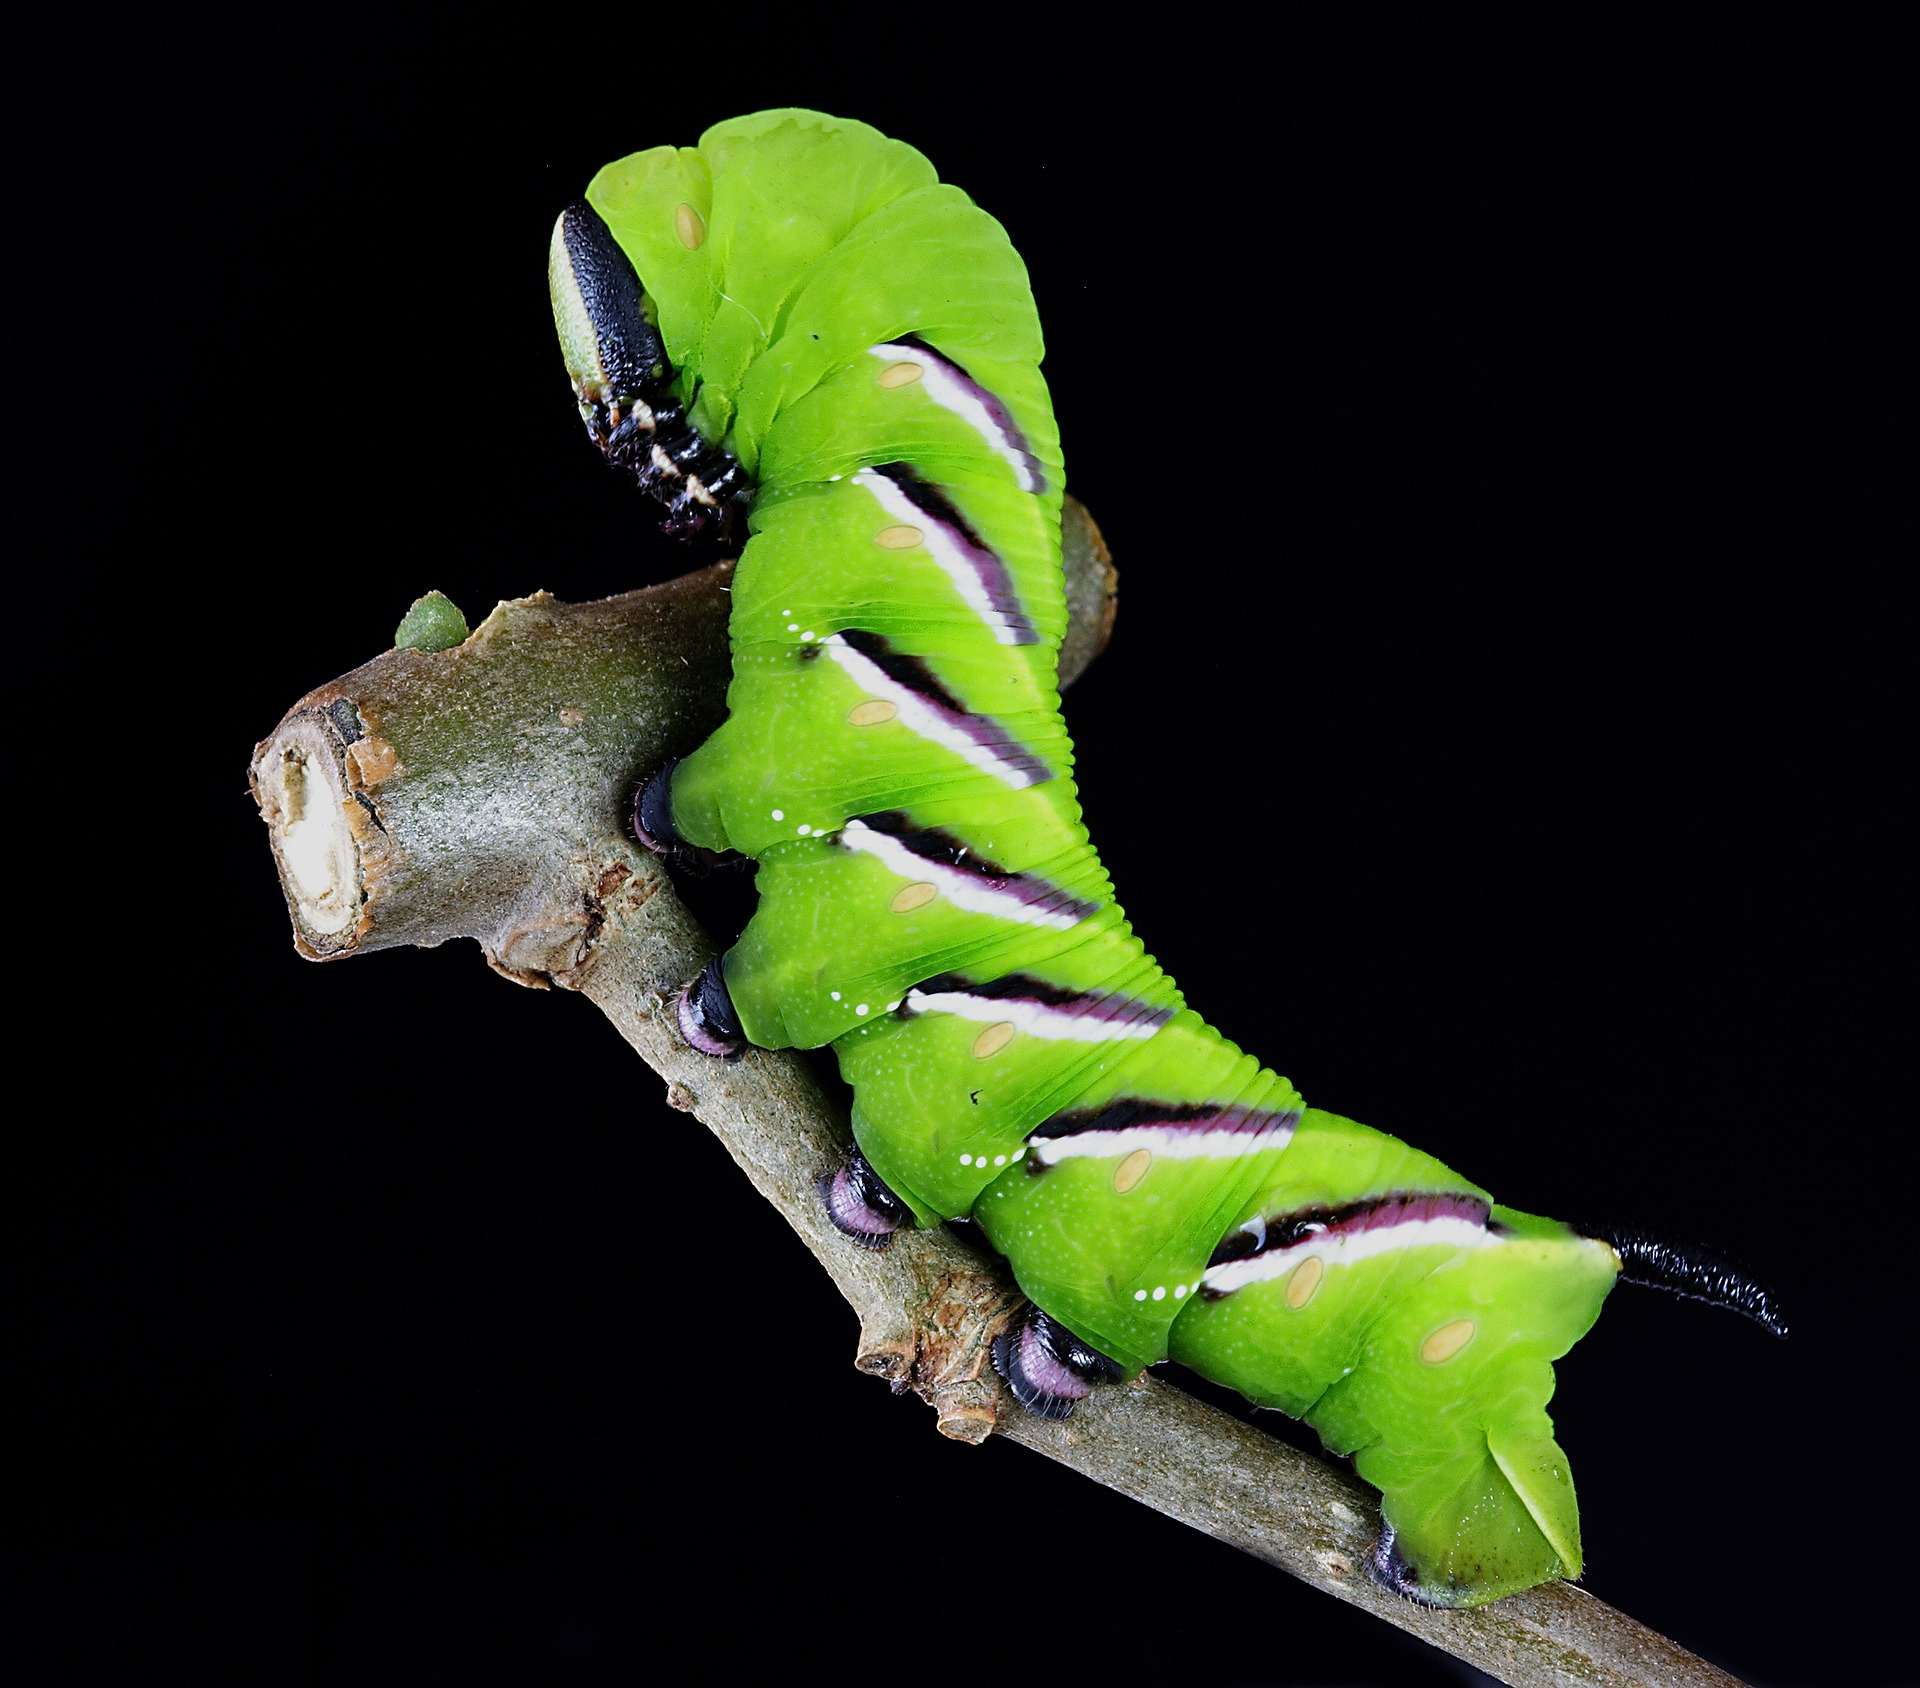 Larva de insecto del orden lepidoptera